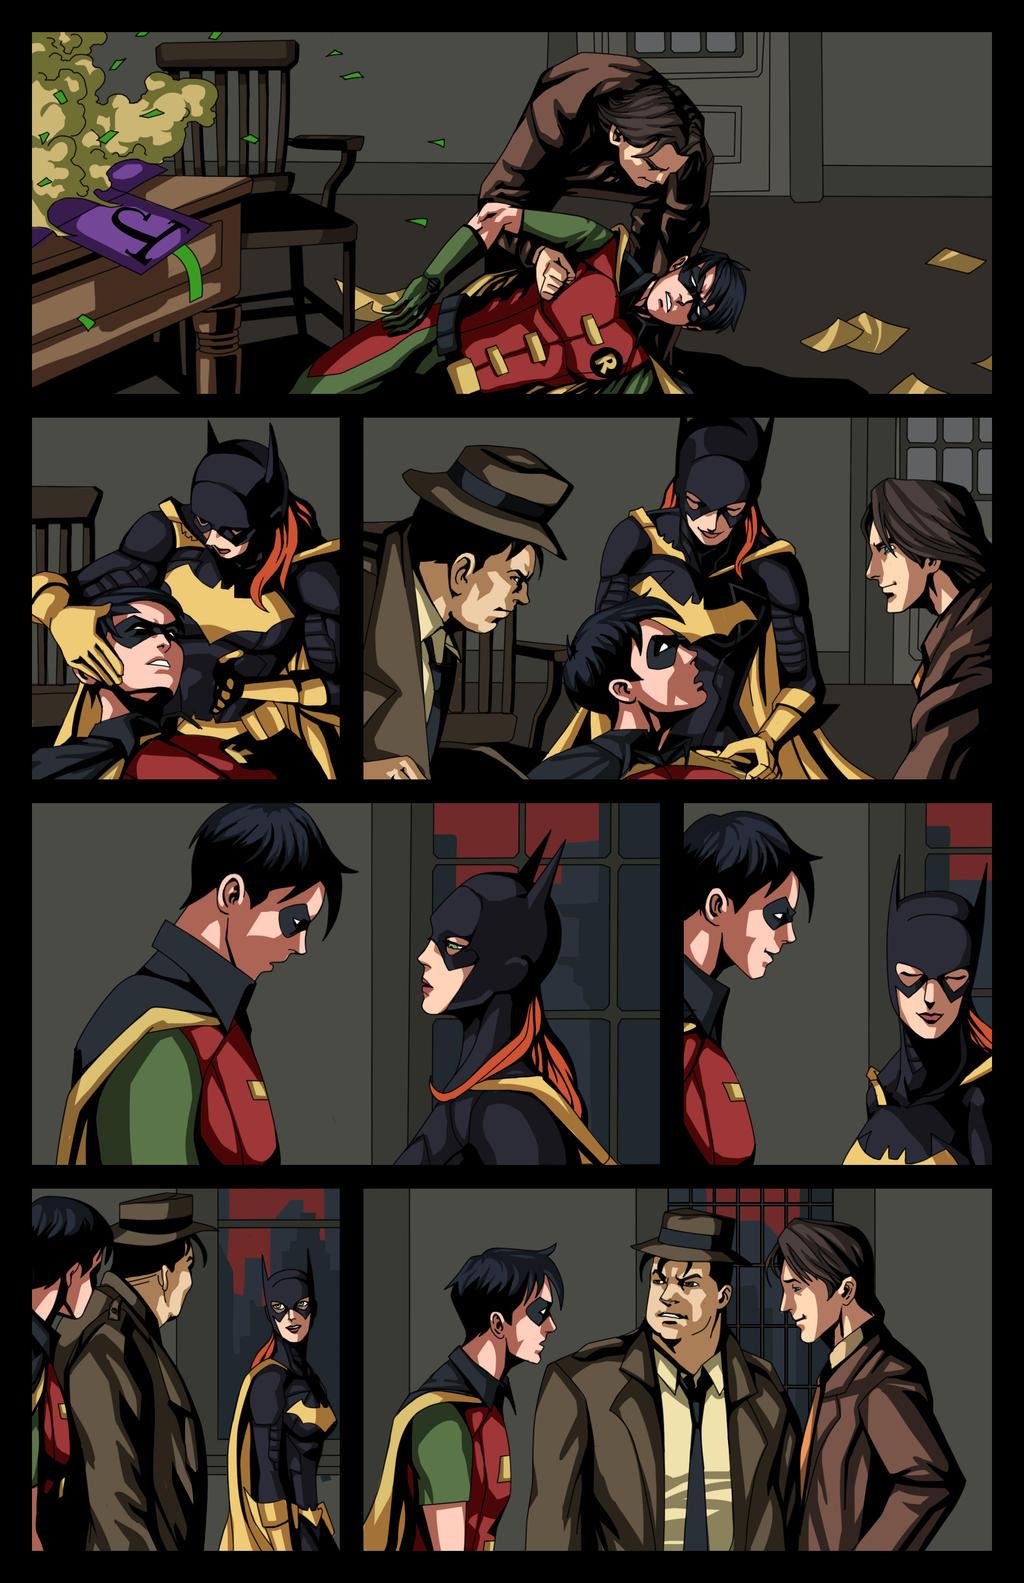 Robin meets Batgirl by phil-cho